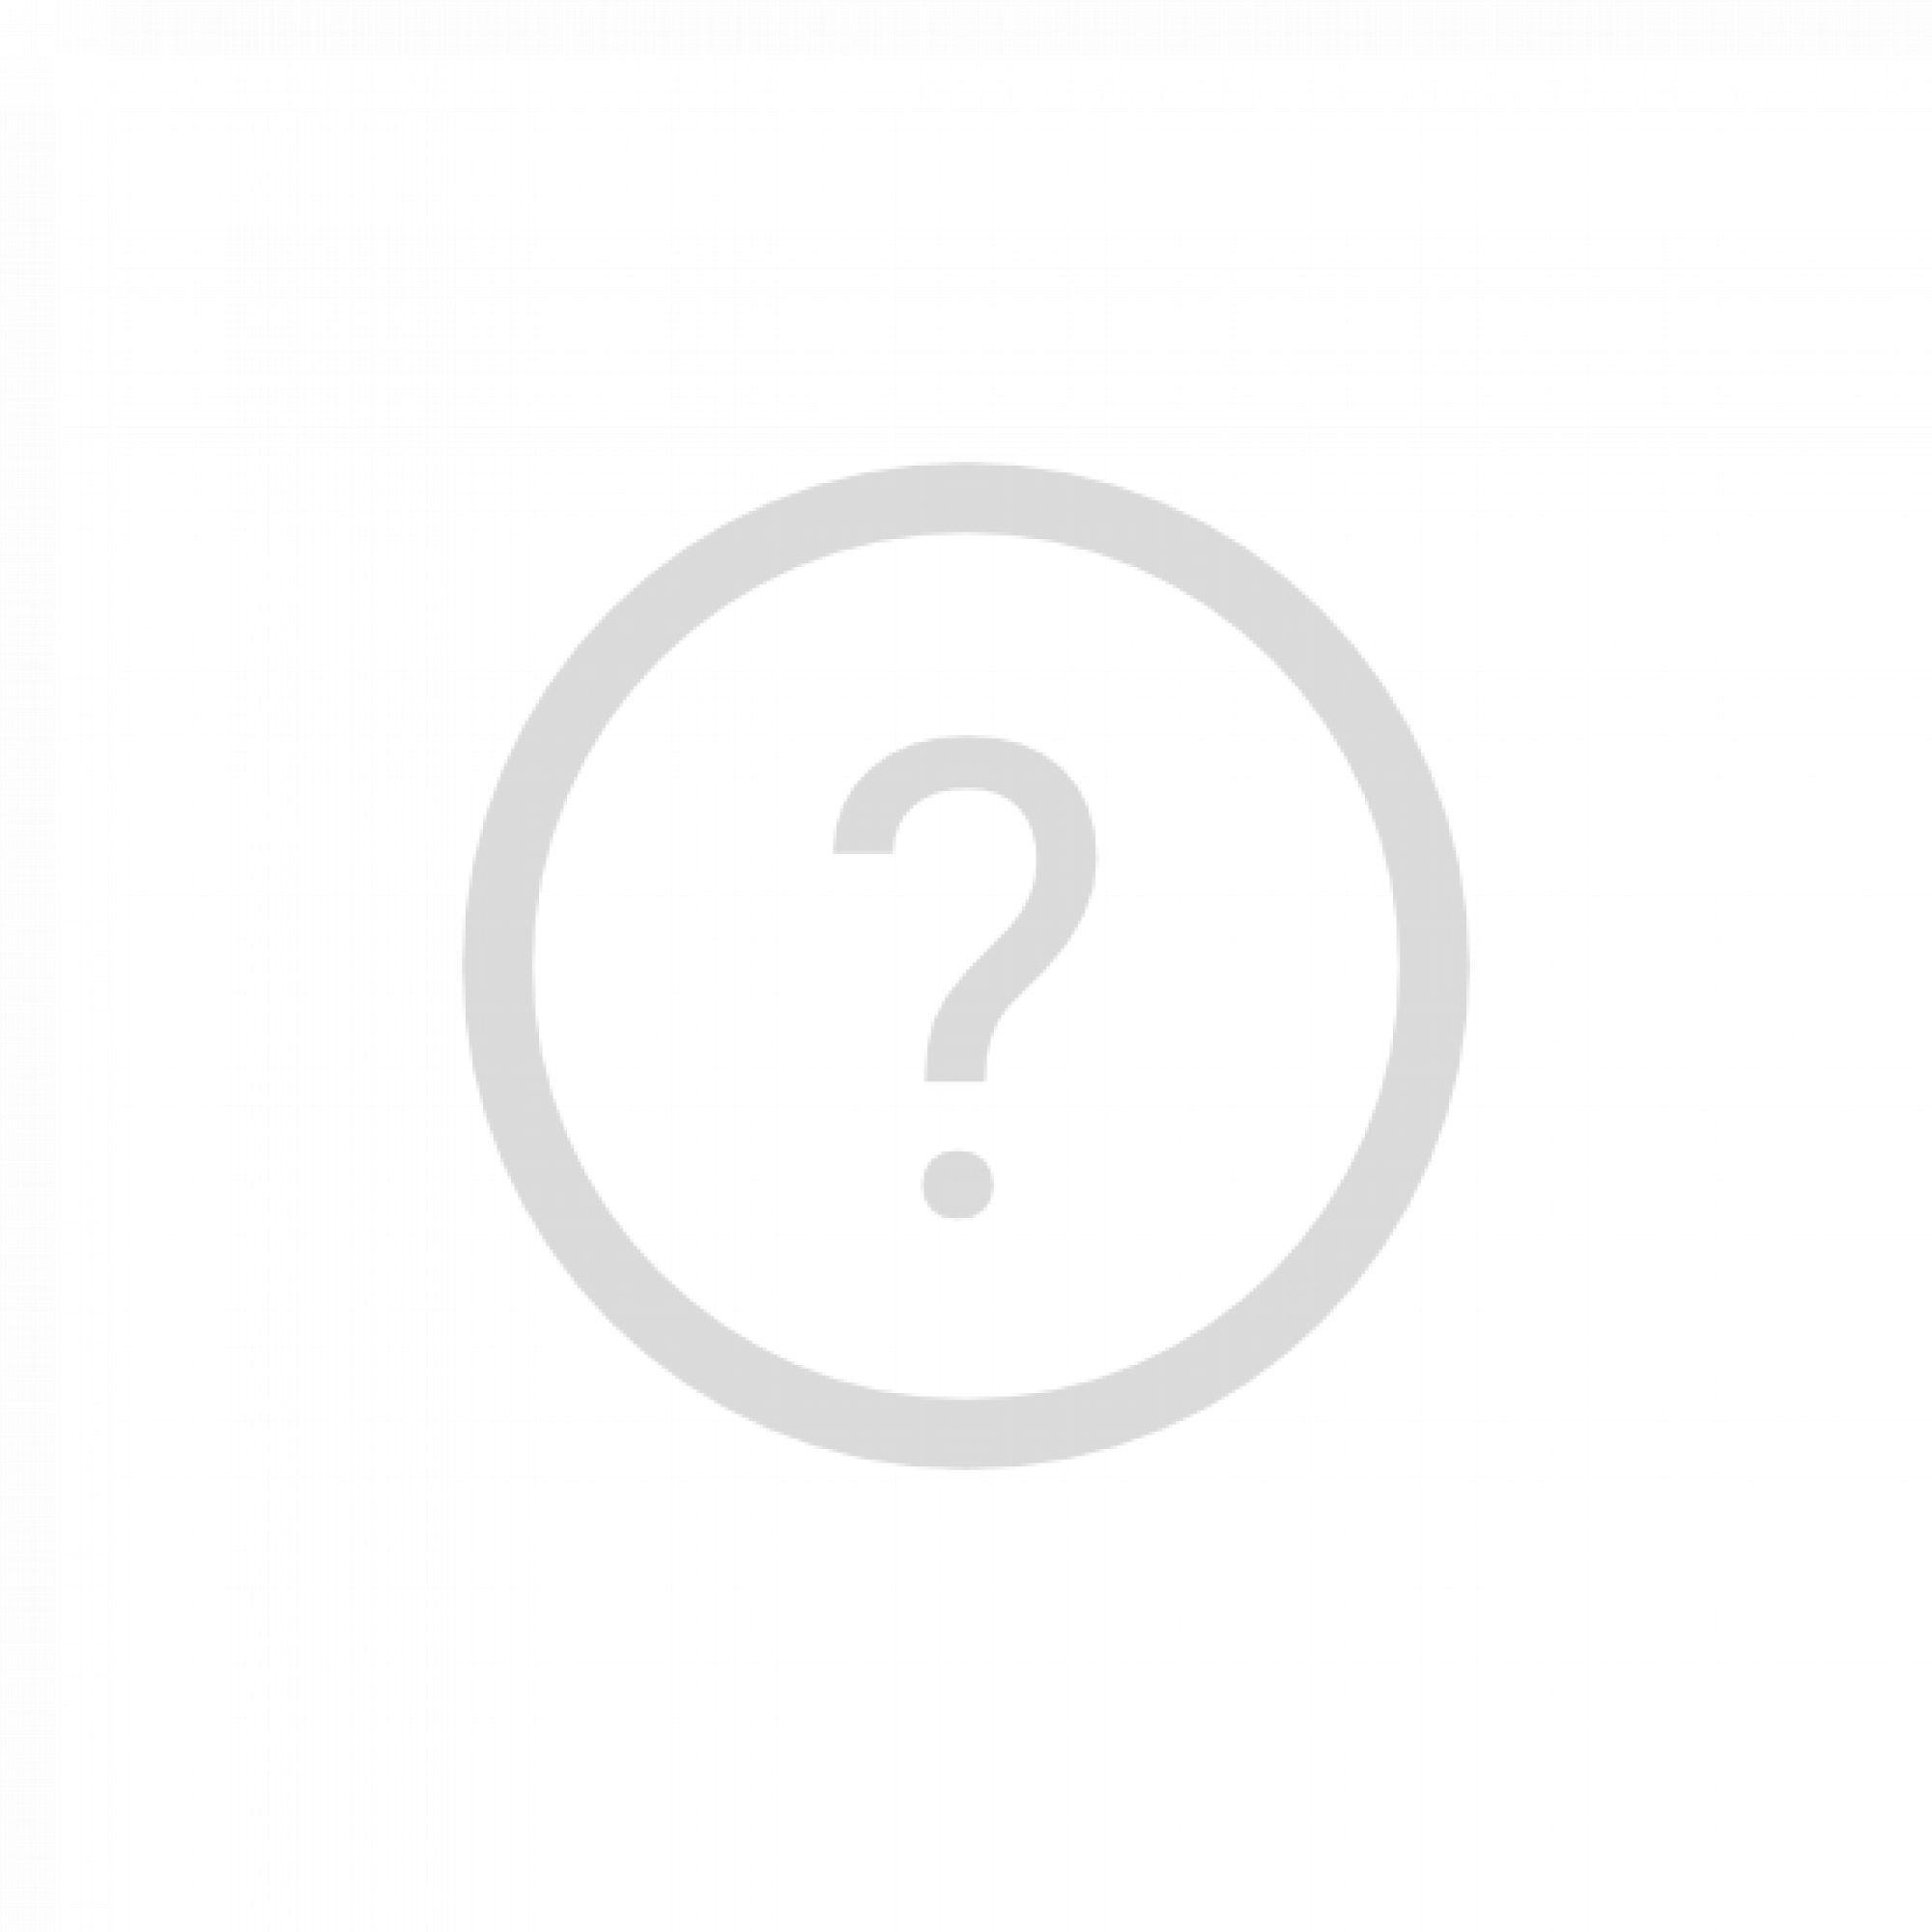 barracuda voltec t6 felgen mattblack puresports schwarz. Black Bedroom Furniture Sets. Home Design Ideas